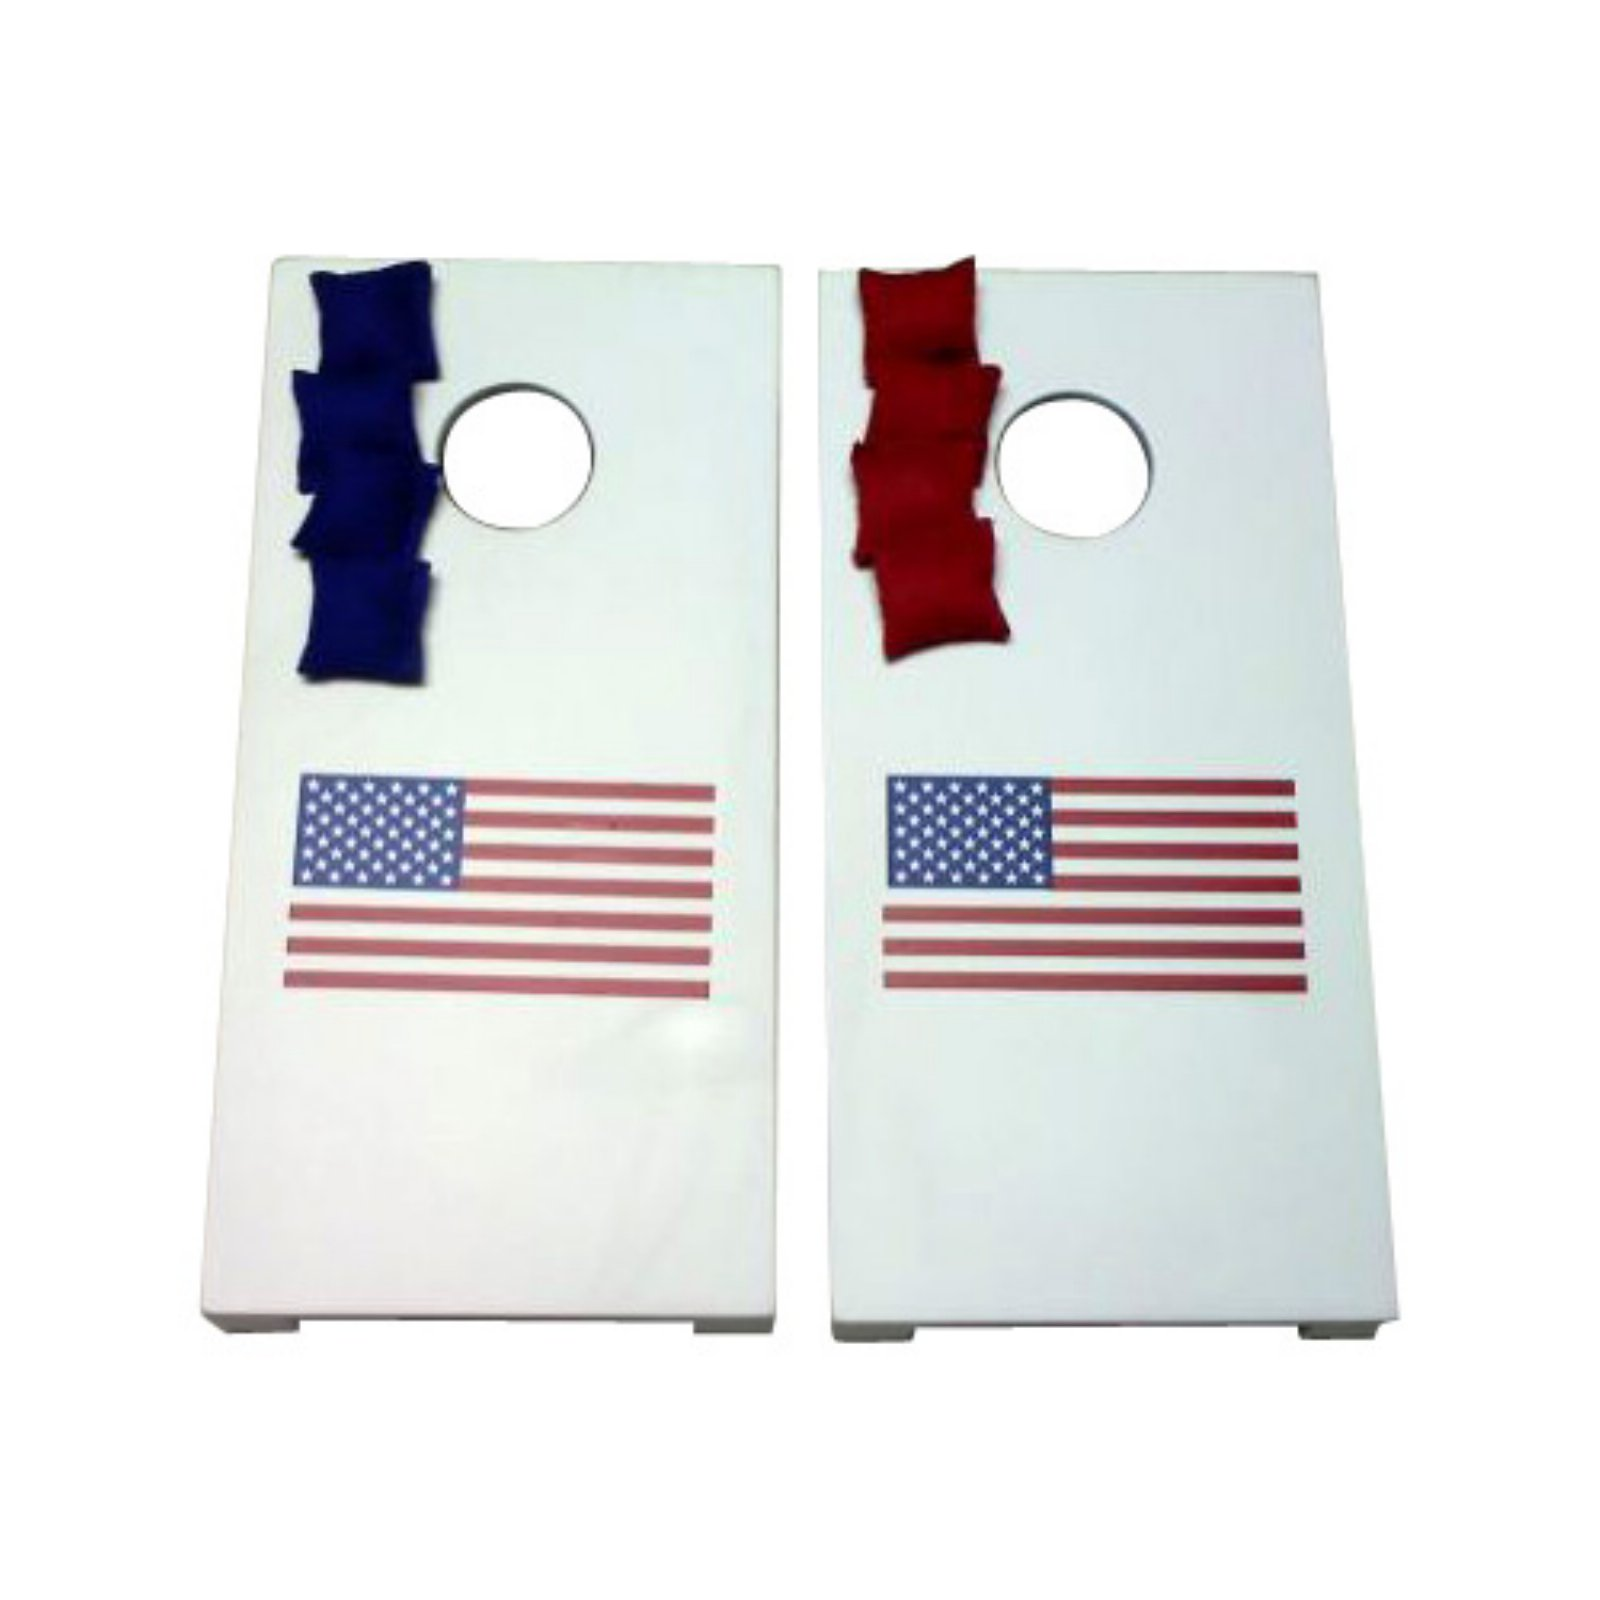 USA Tabletop Cornhole Set by AJJ Cornhole